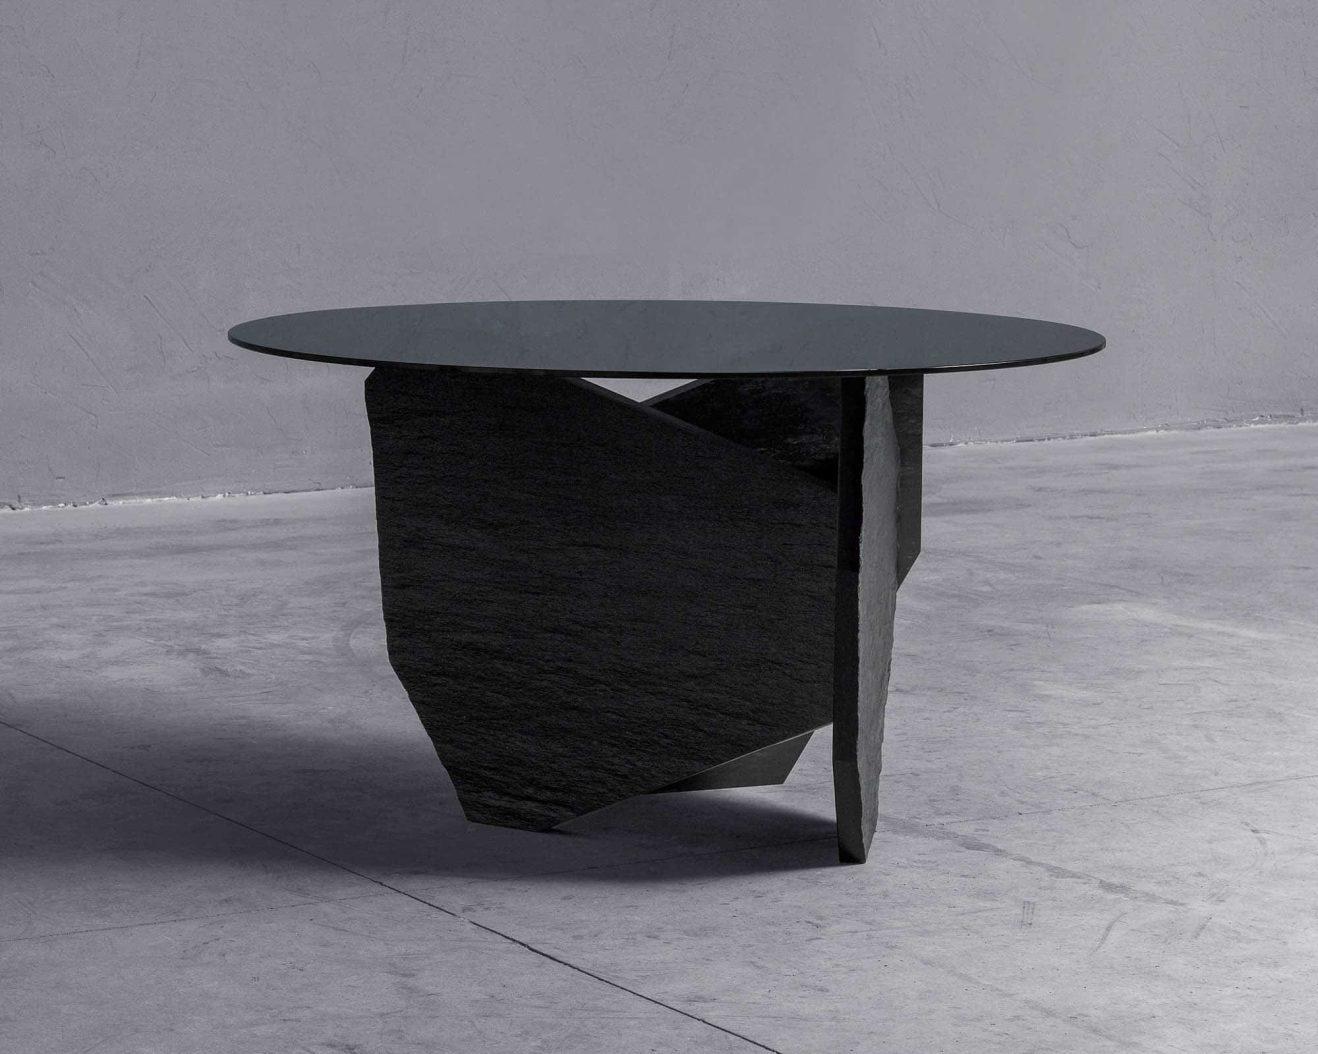 Frederic-Saulou-Fragmente-Dining Table-Savannah Bay Gallery-2